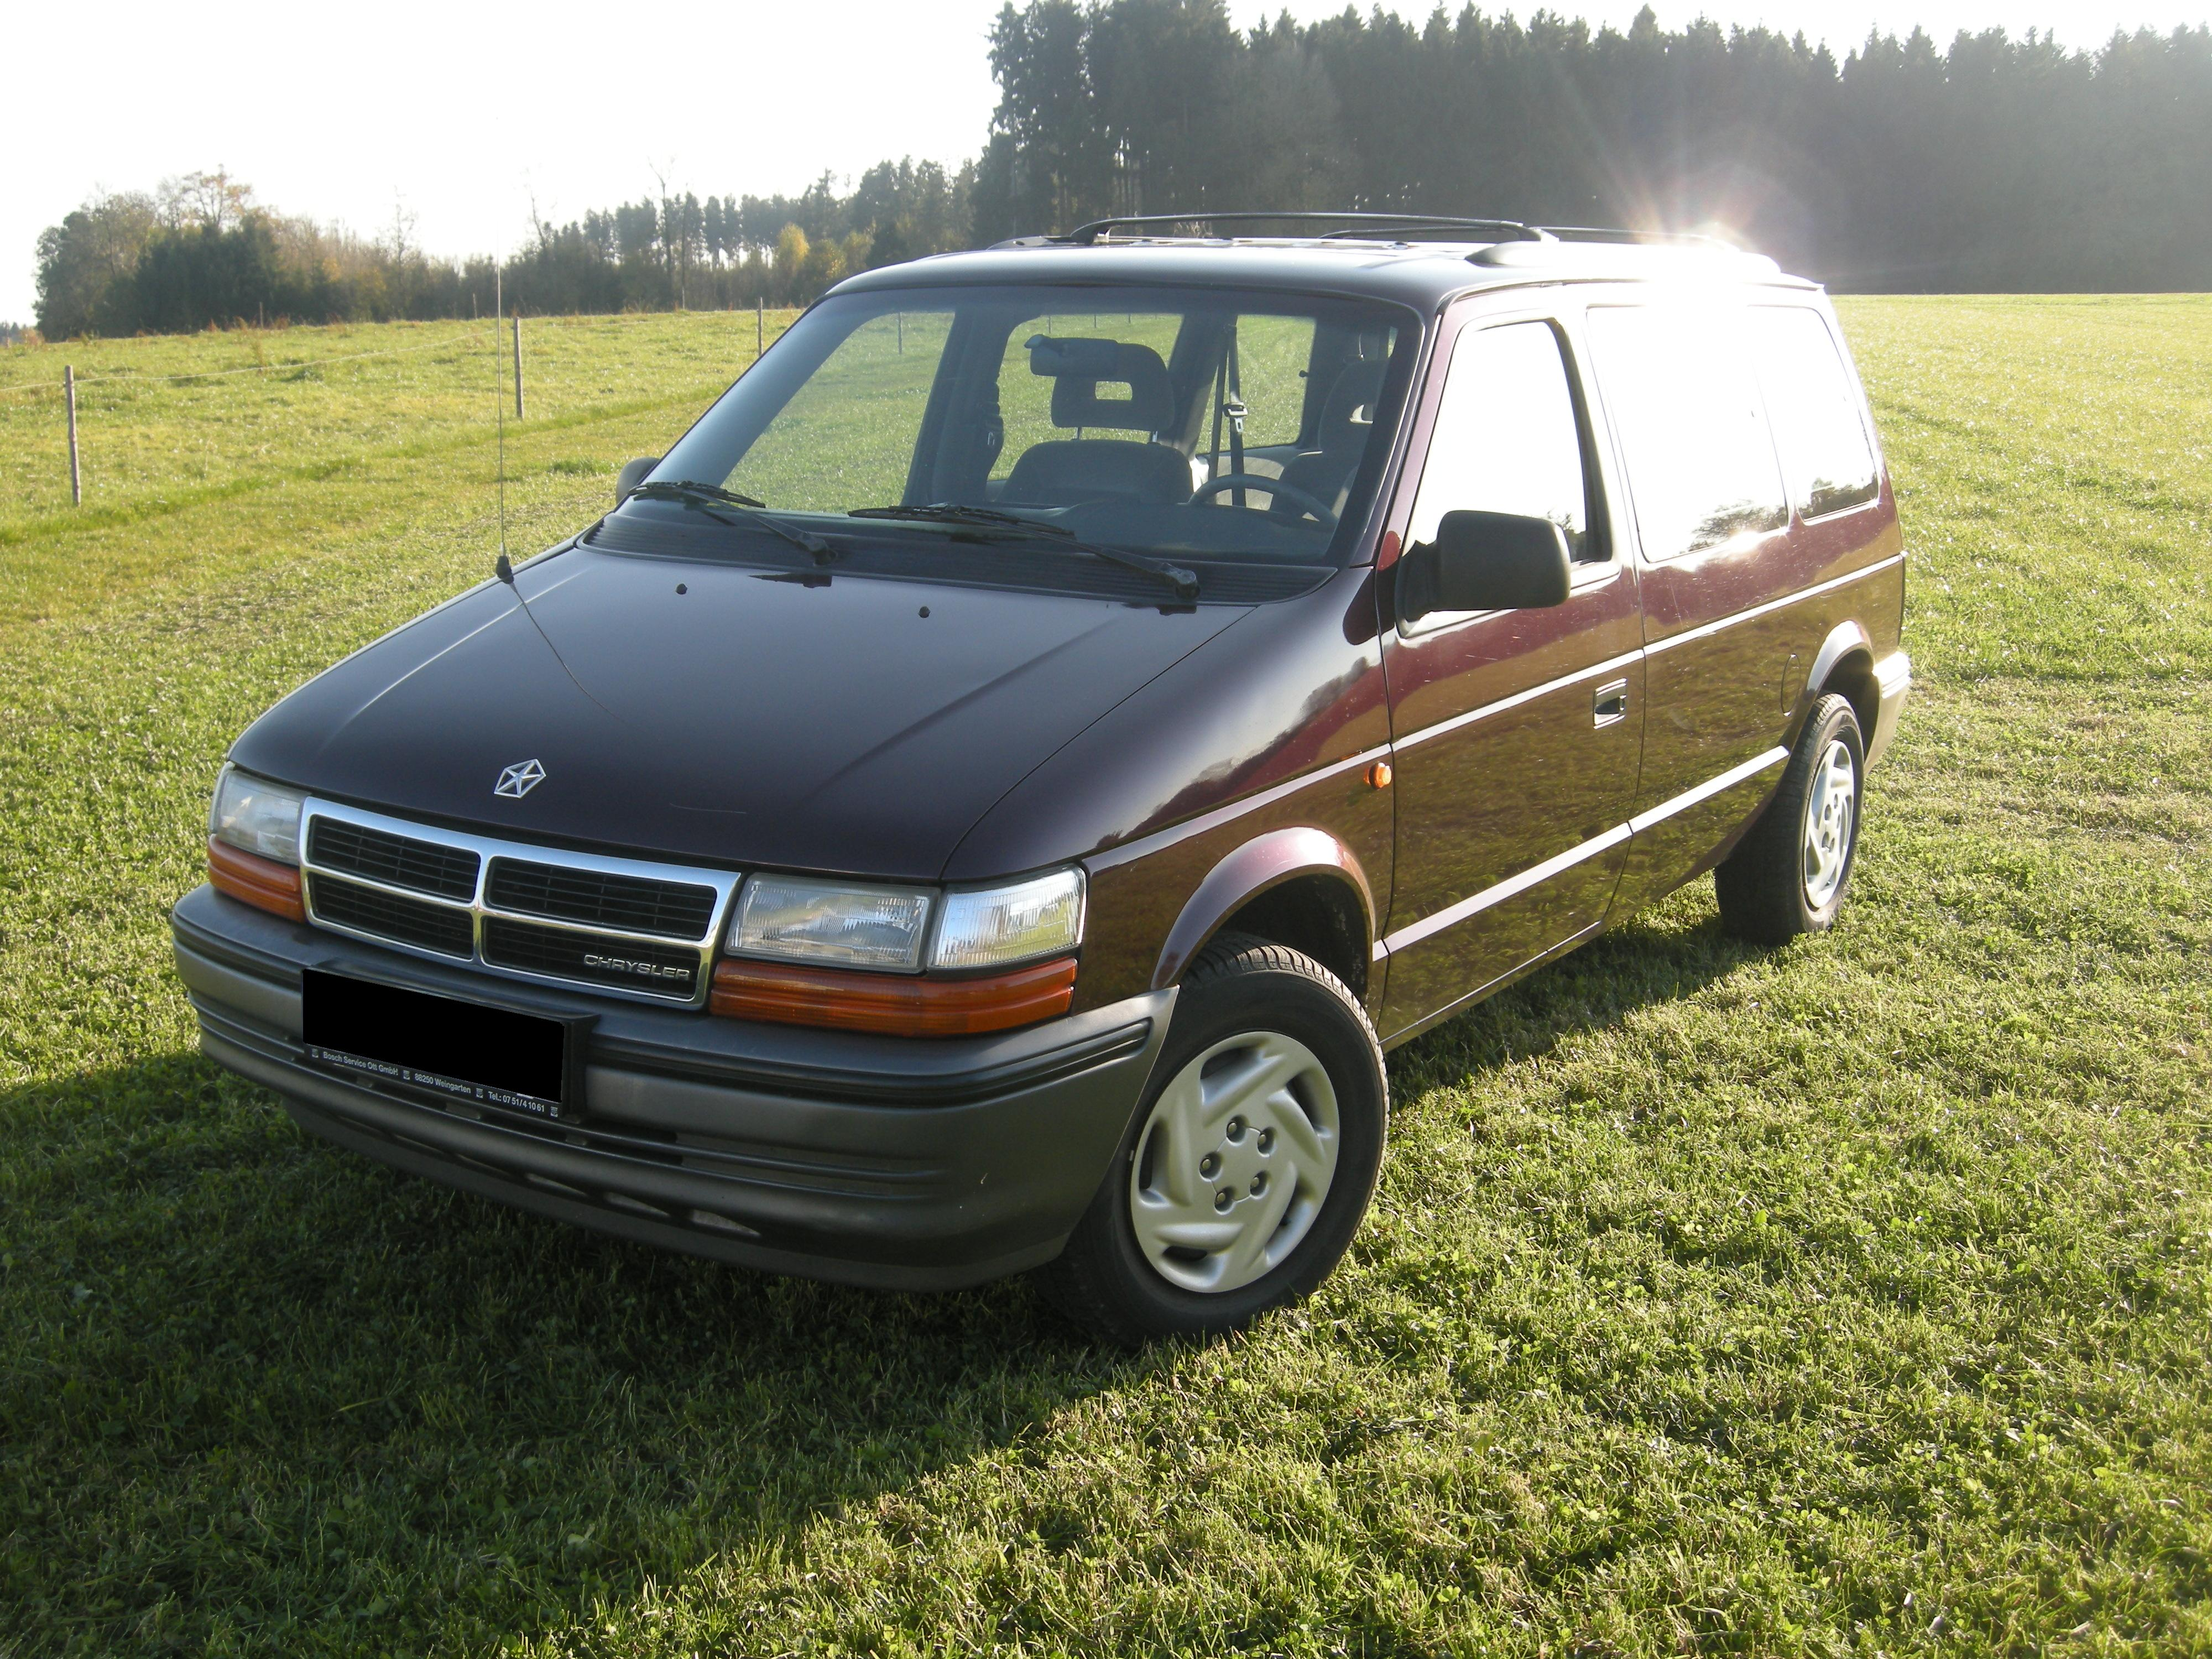 Chrysler Voyager II 1991 - 1995 Minivan #3